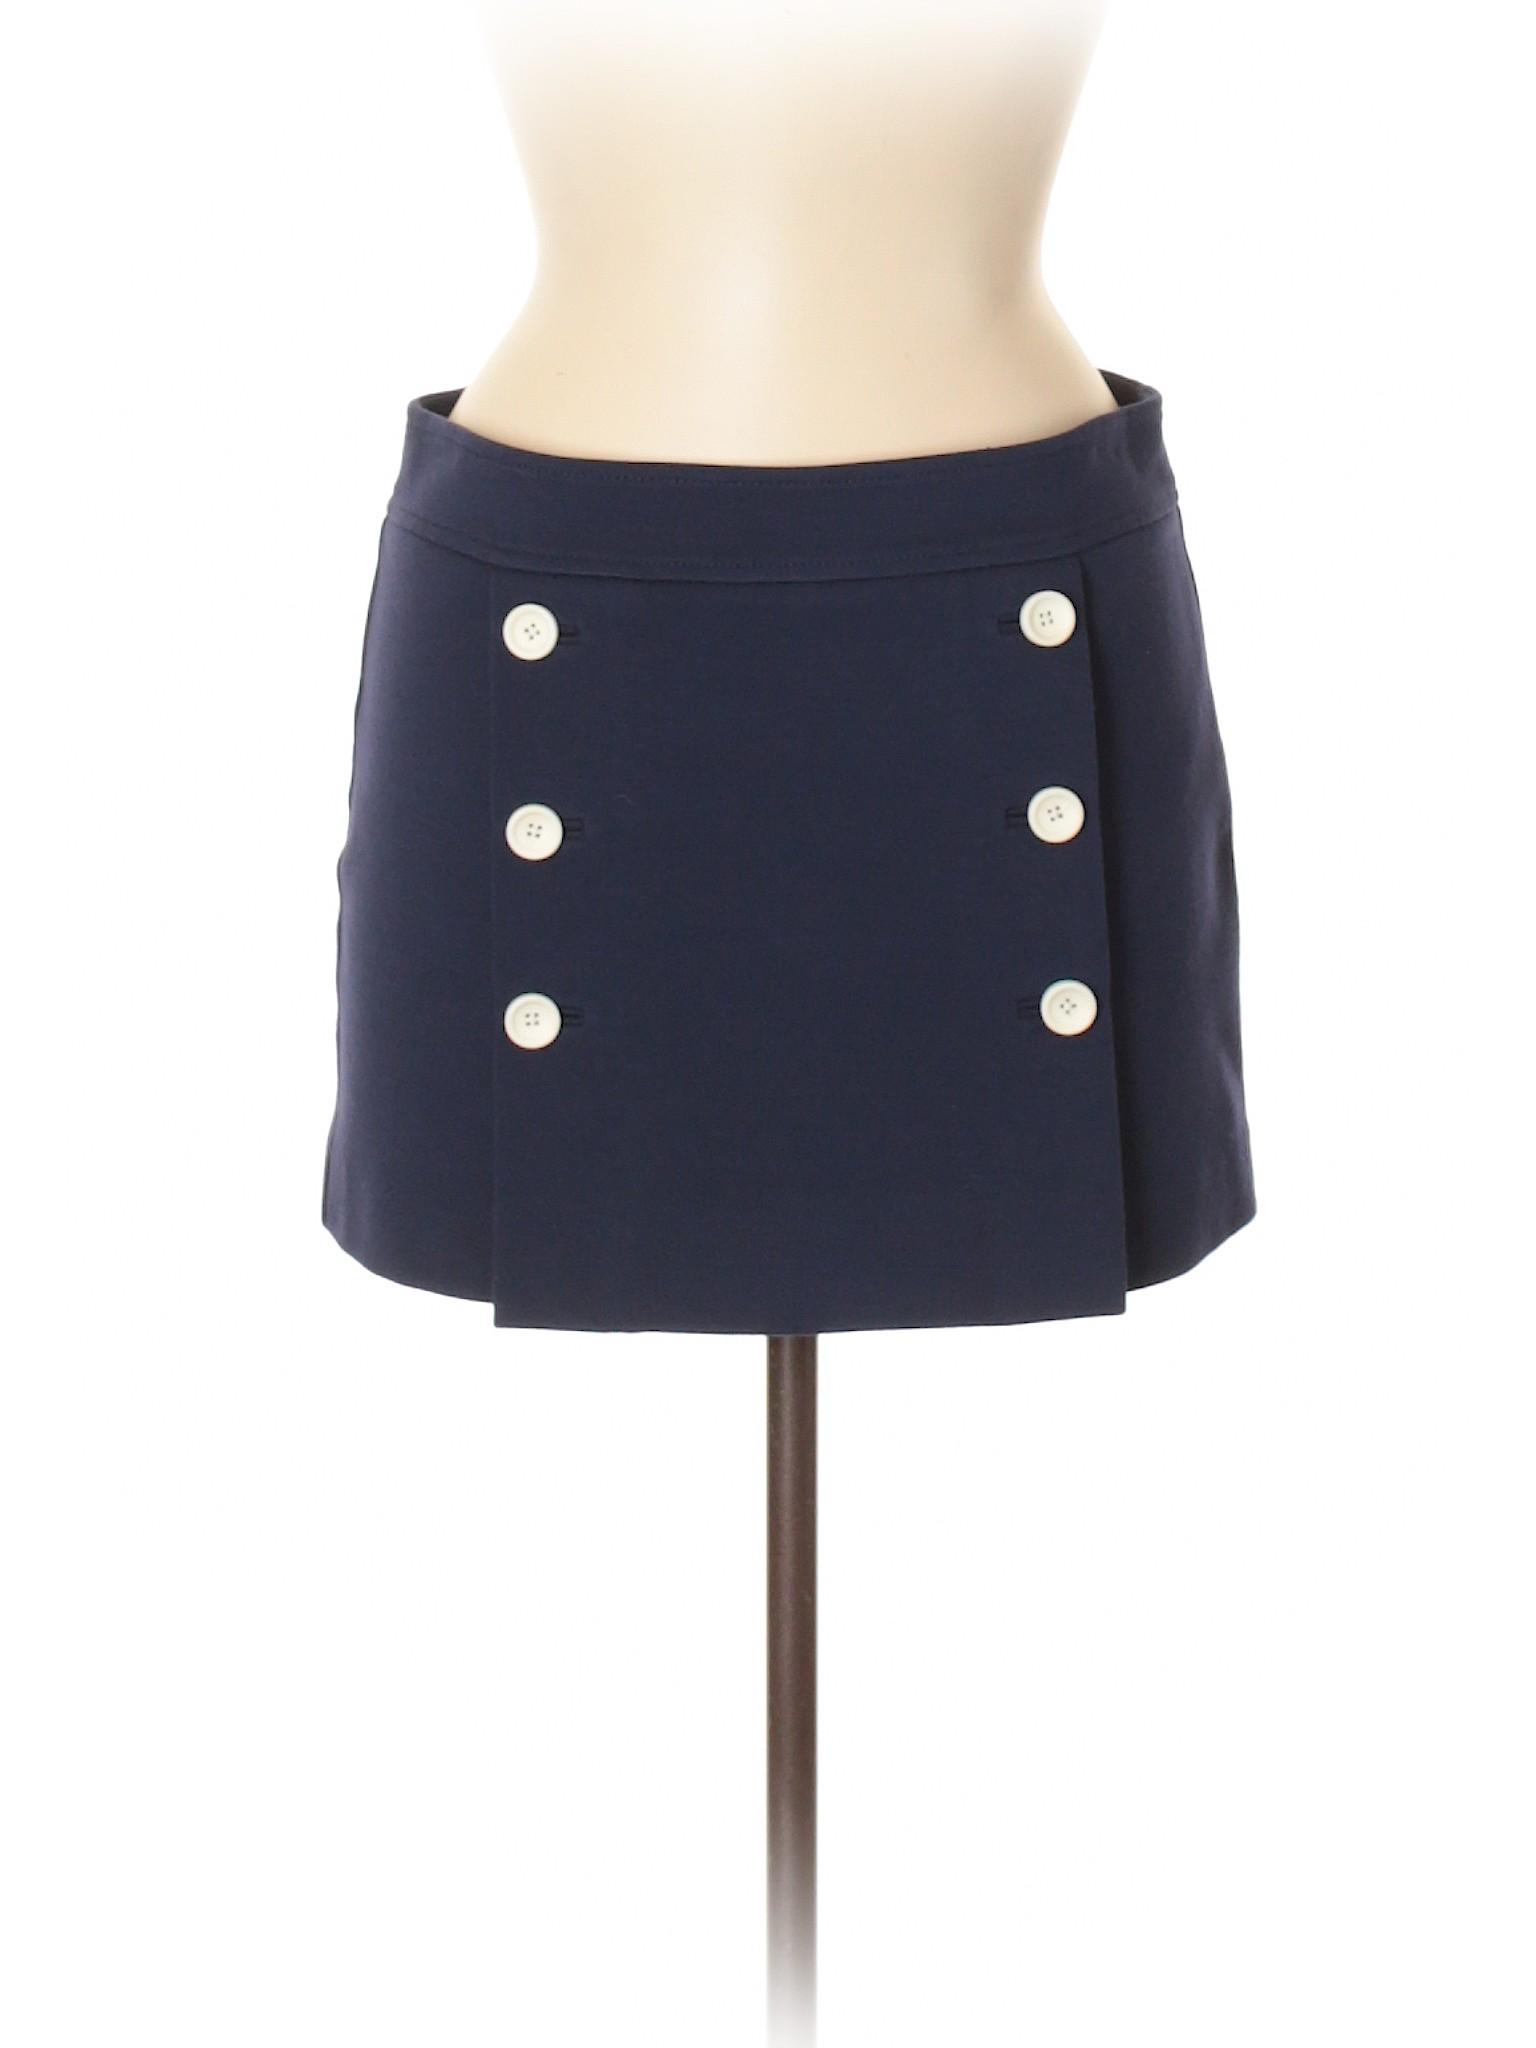 Skirt Skirt Skirt Boutique Boutique Boutique Casual Boutique Boutique Casual Casual Skirt Casual Boutique Casual Skirt Boutique Skirt Casual Afq4gS04